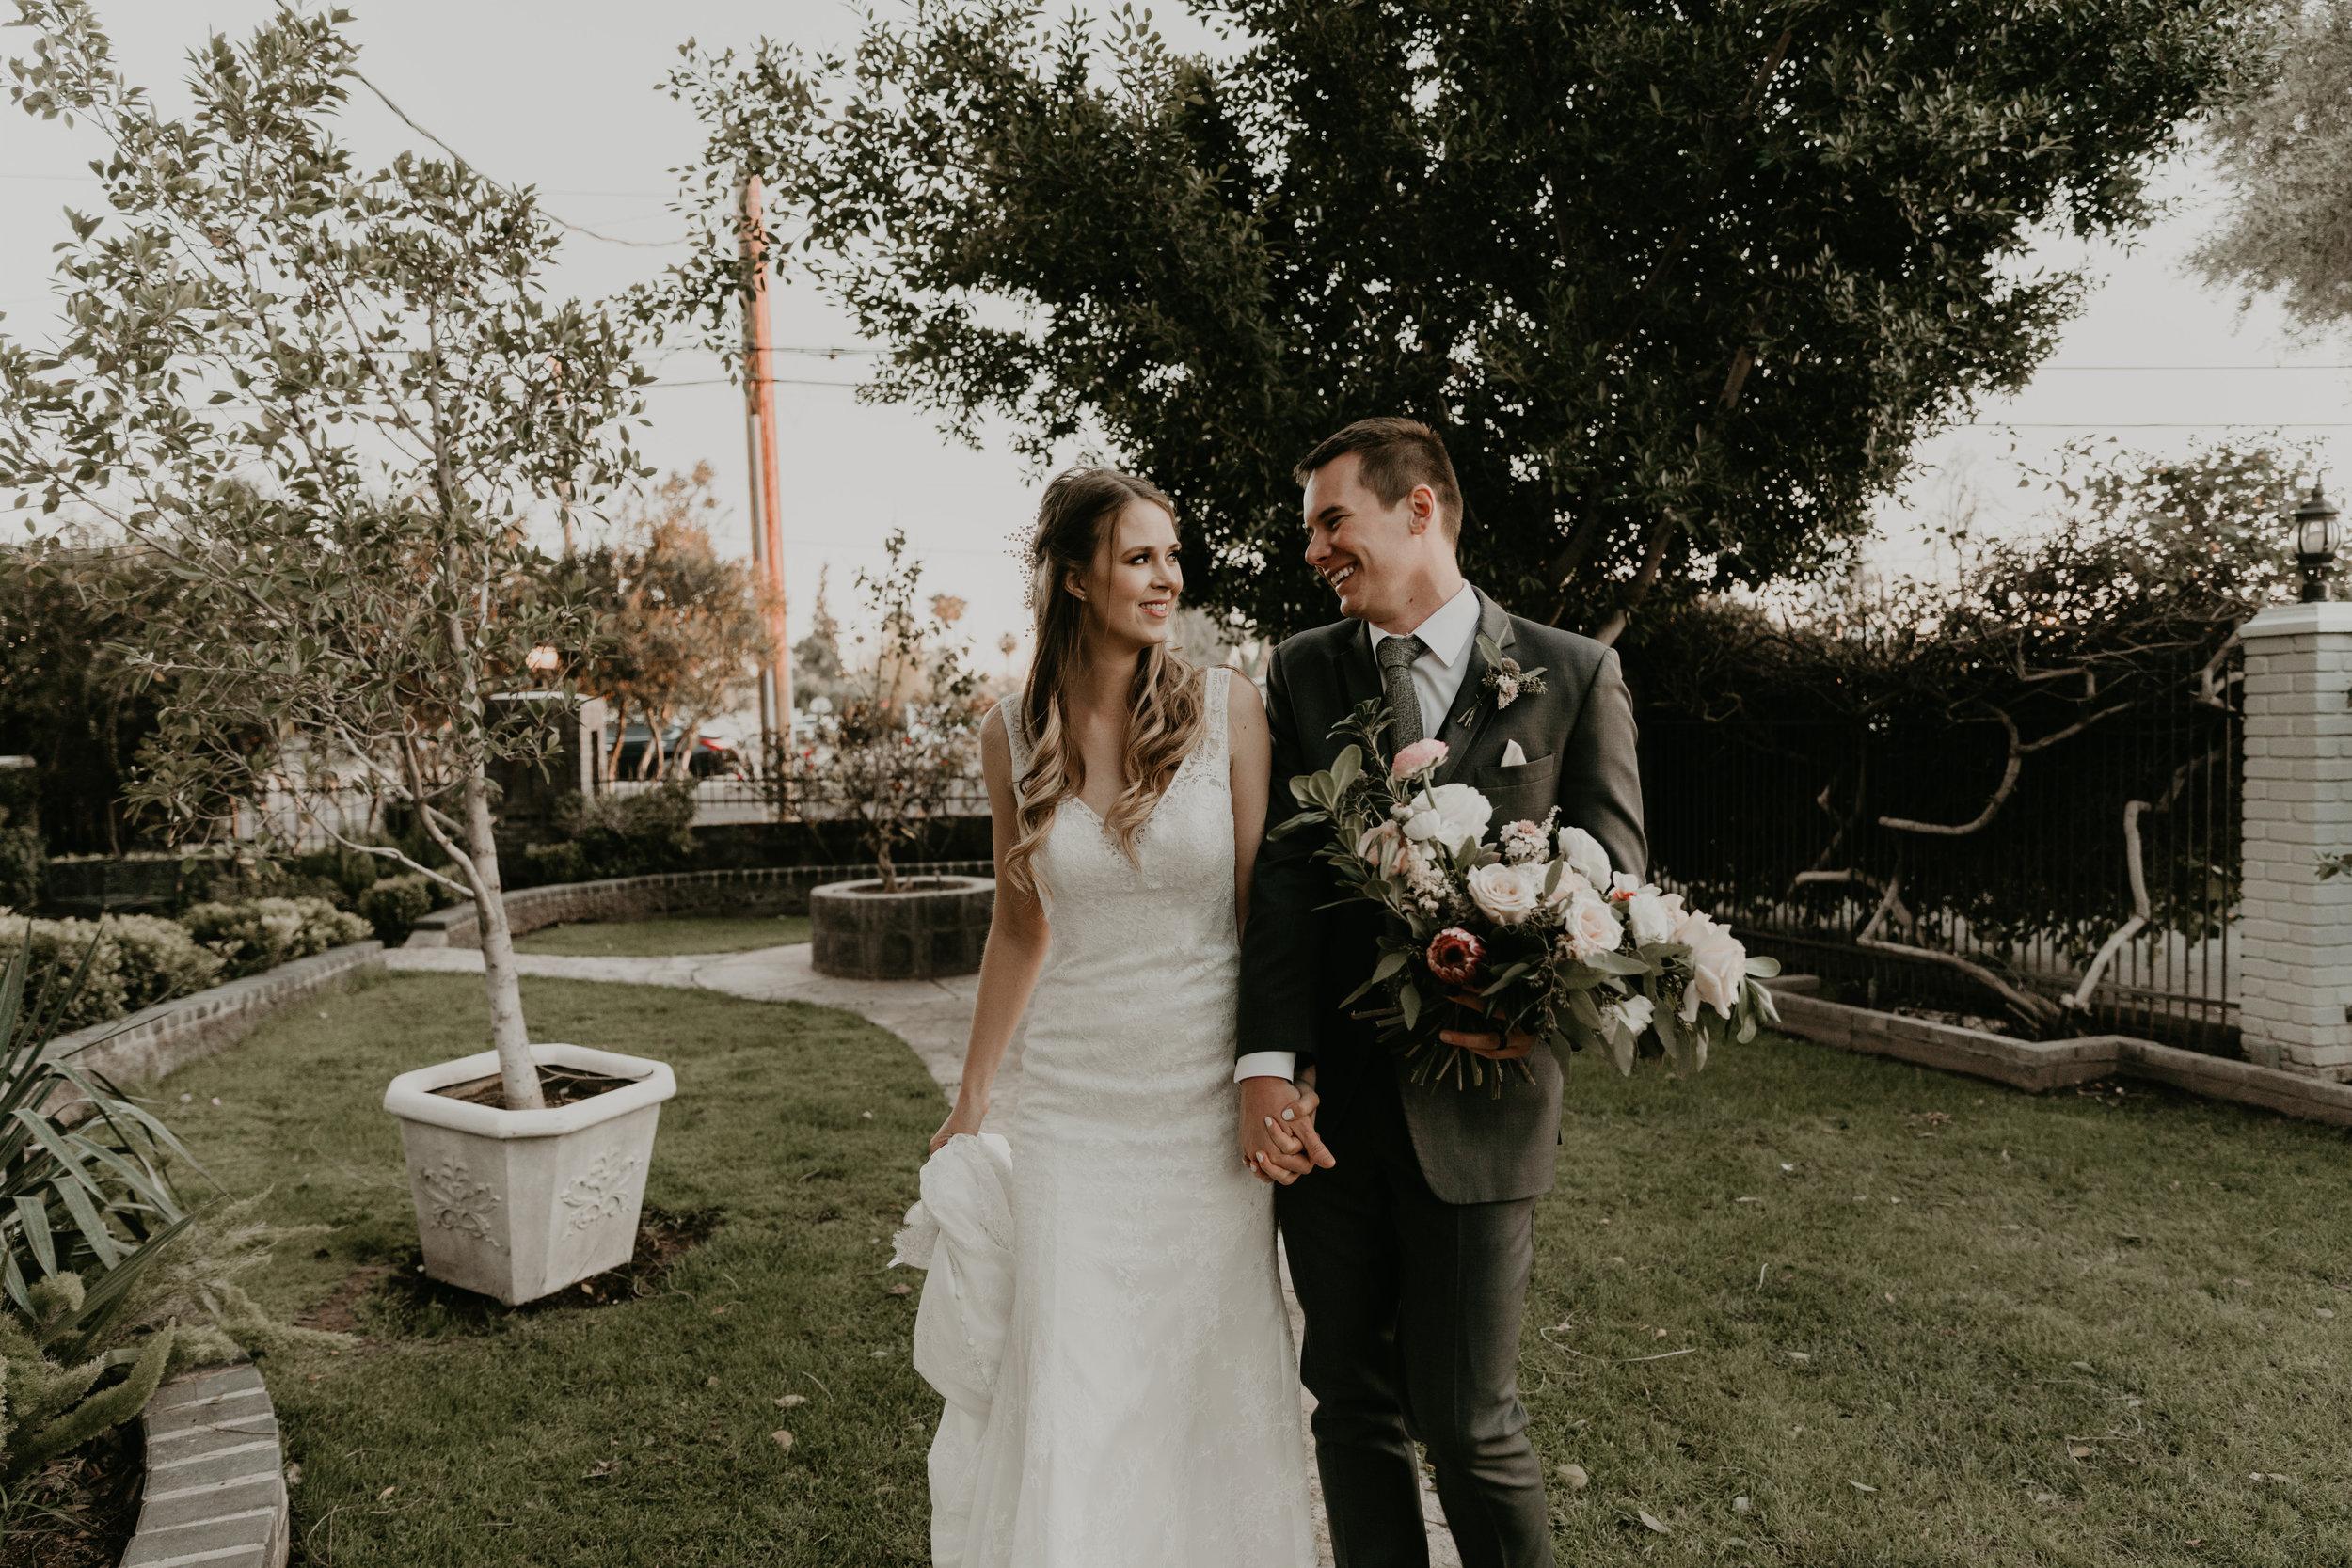 The_Wright_House_Wedding-Maja_and_Josh-KaliMPhotos (246 of 249).jpg